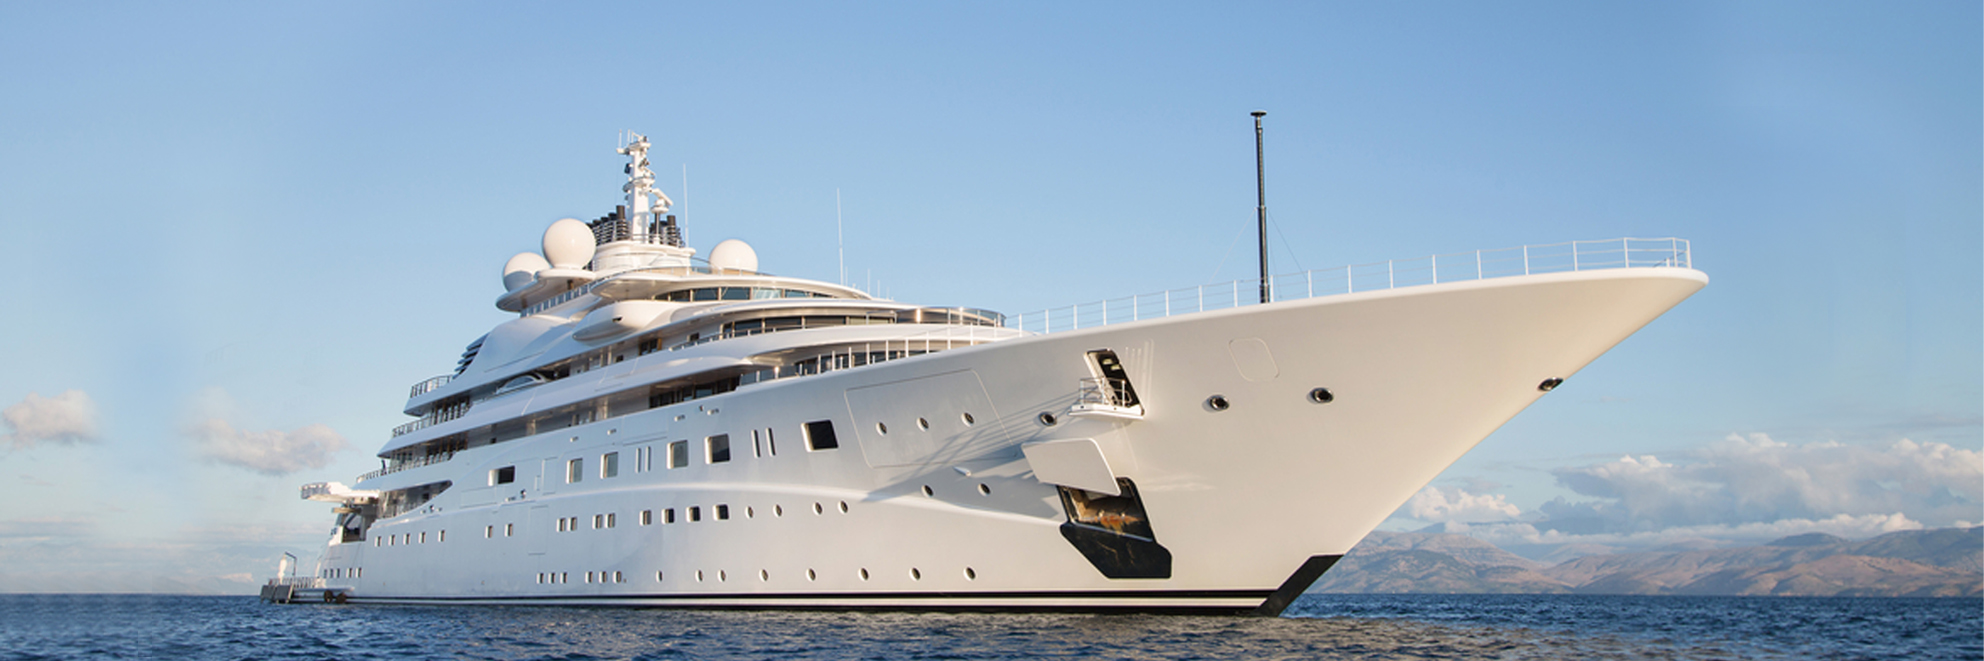 Copy of Yacht